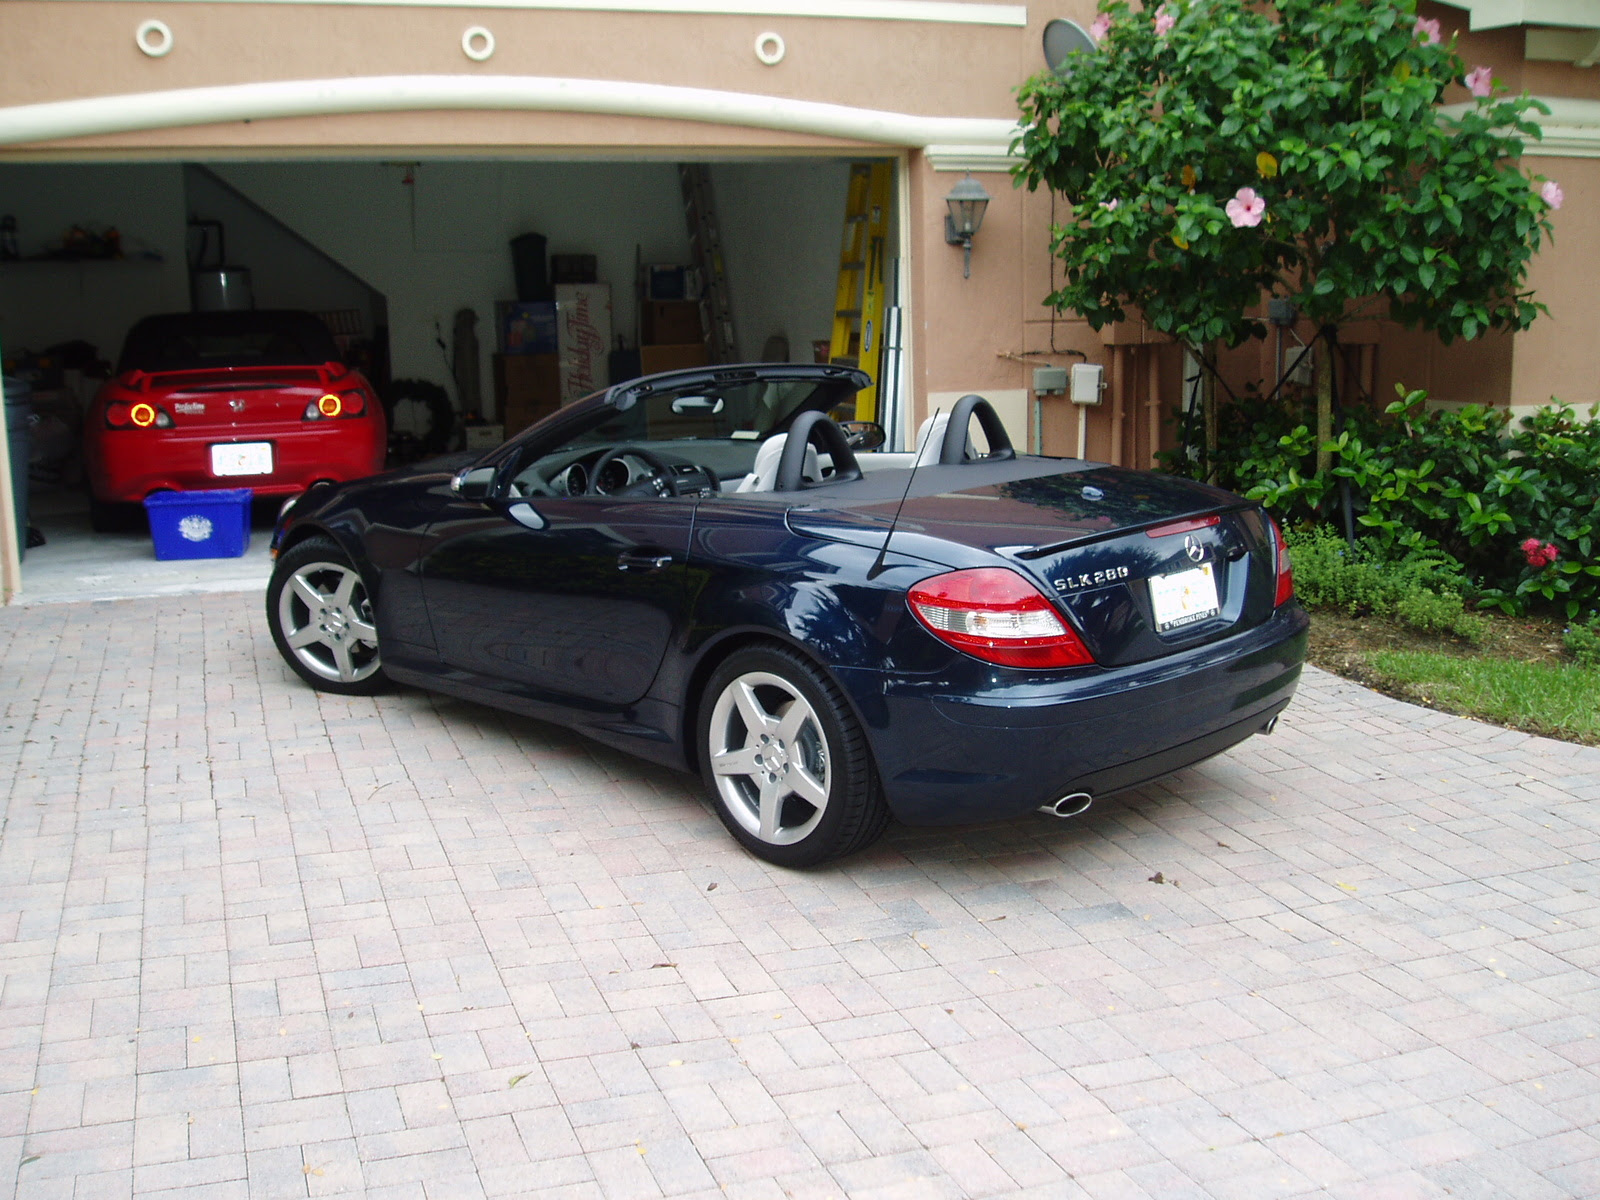 2007 Mercedes-Benz SLK-Class - Exterior Pictures - CarGurus